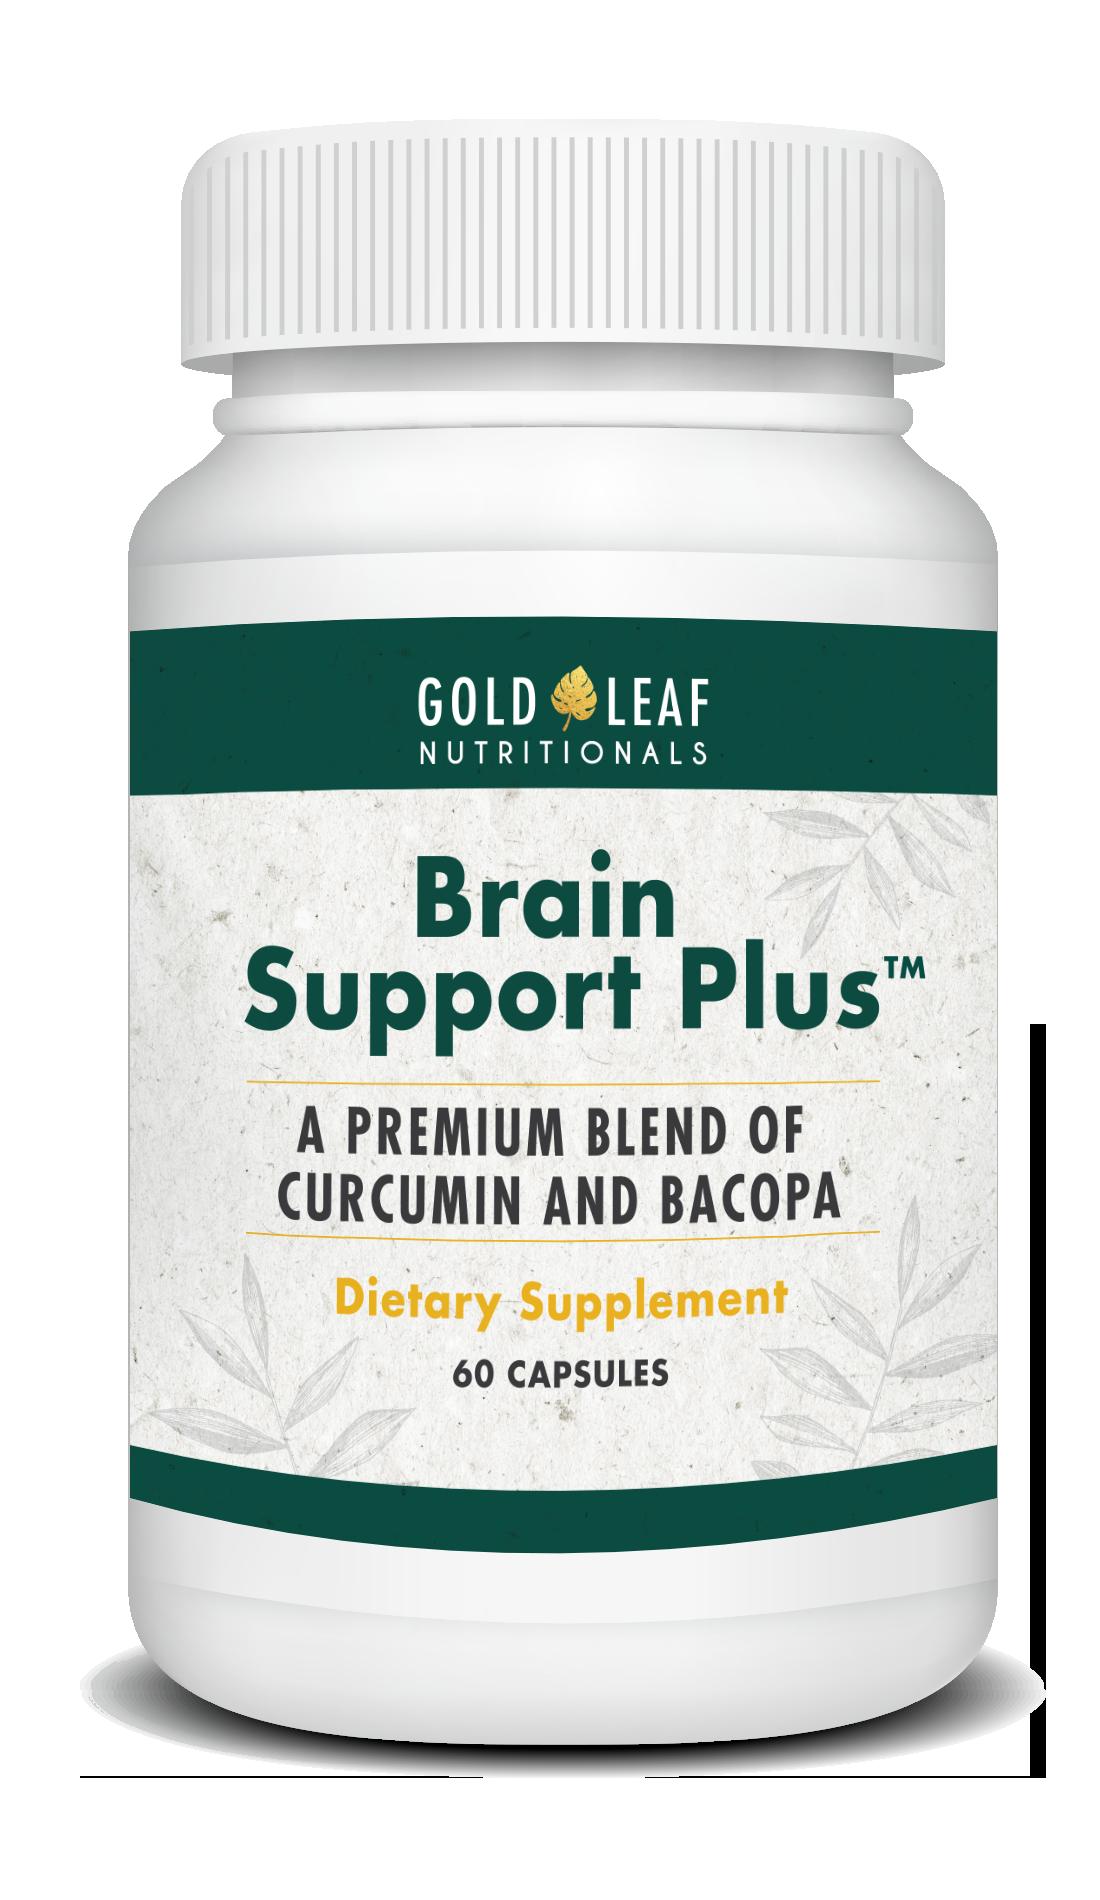 Brain Support Plus Bottle